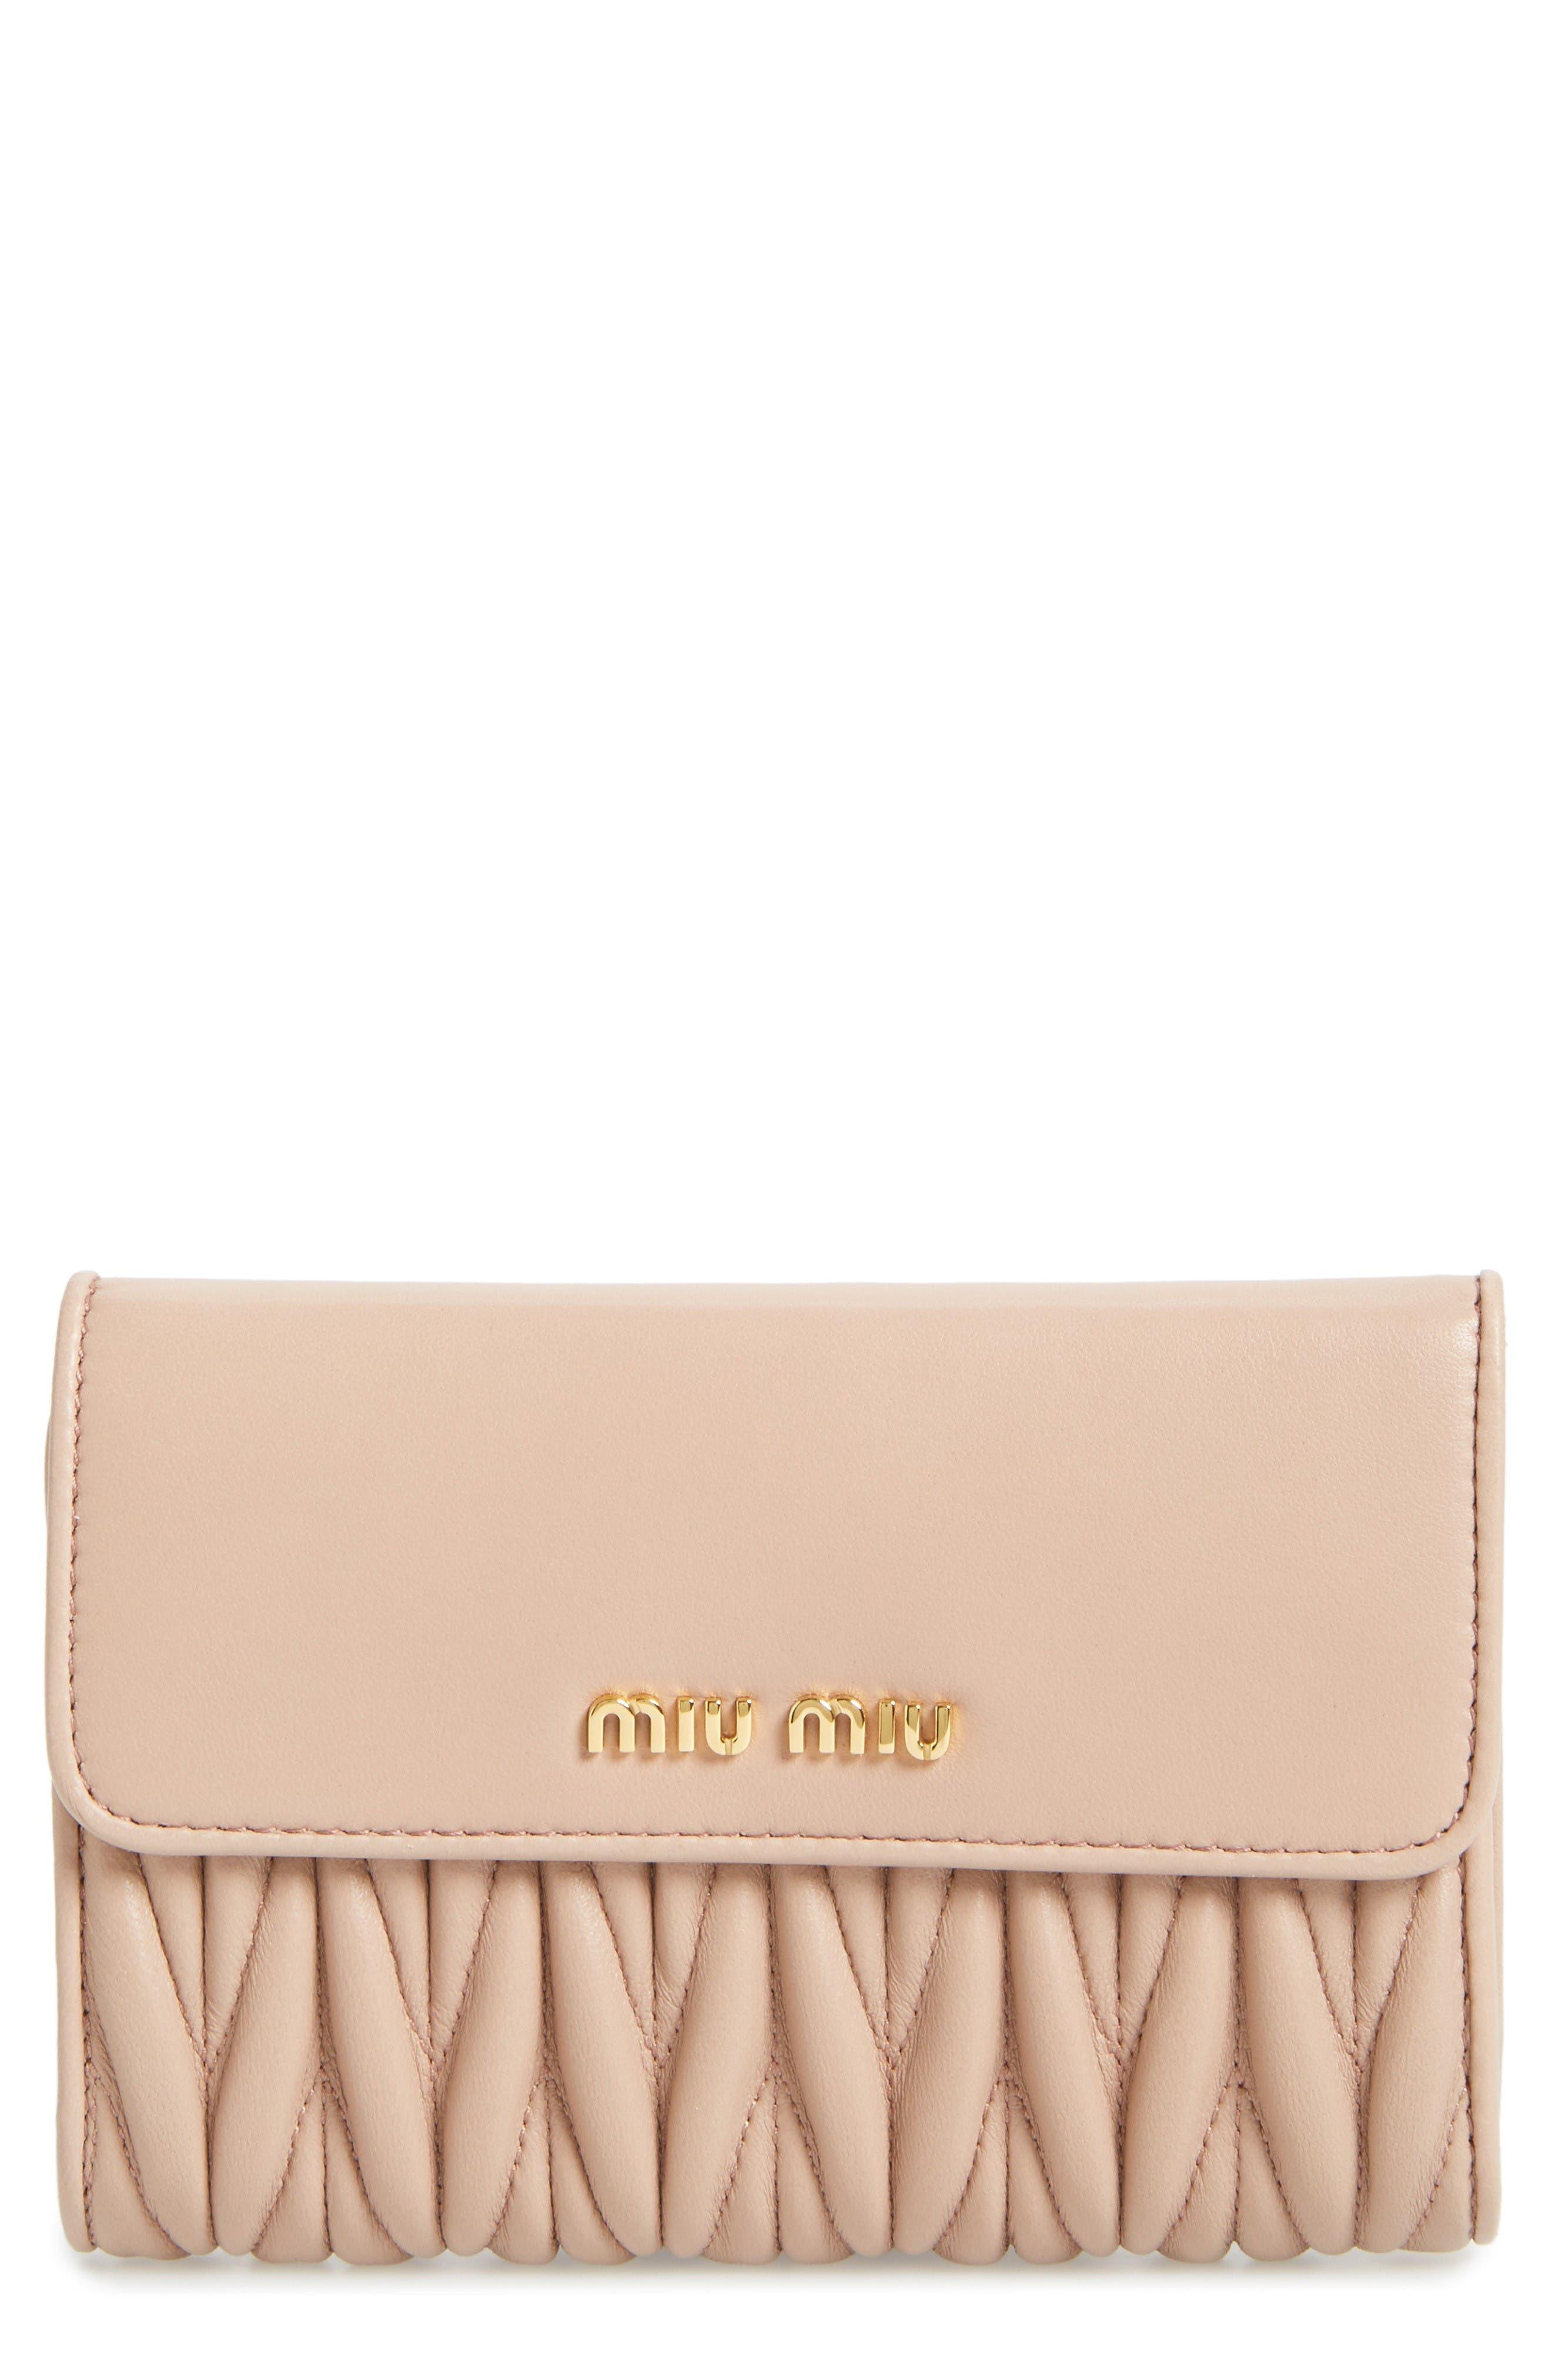 Miu Miu Matelassé Leather French Wallet